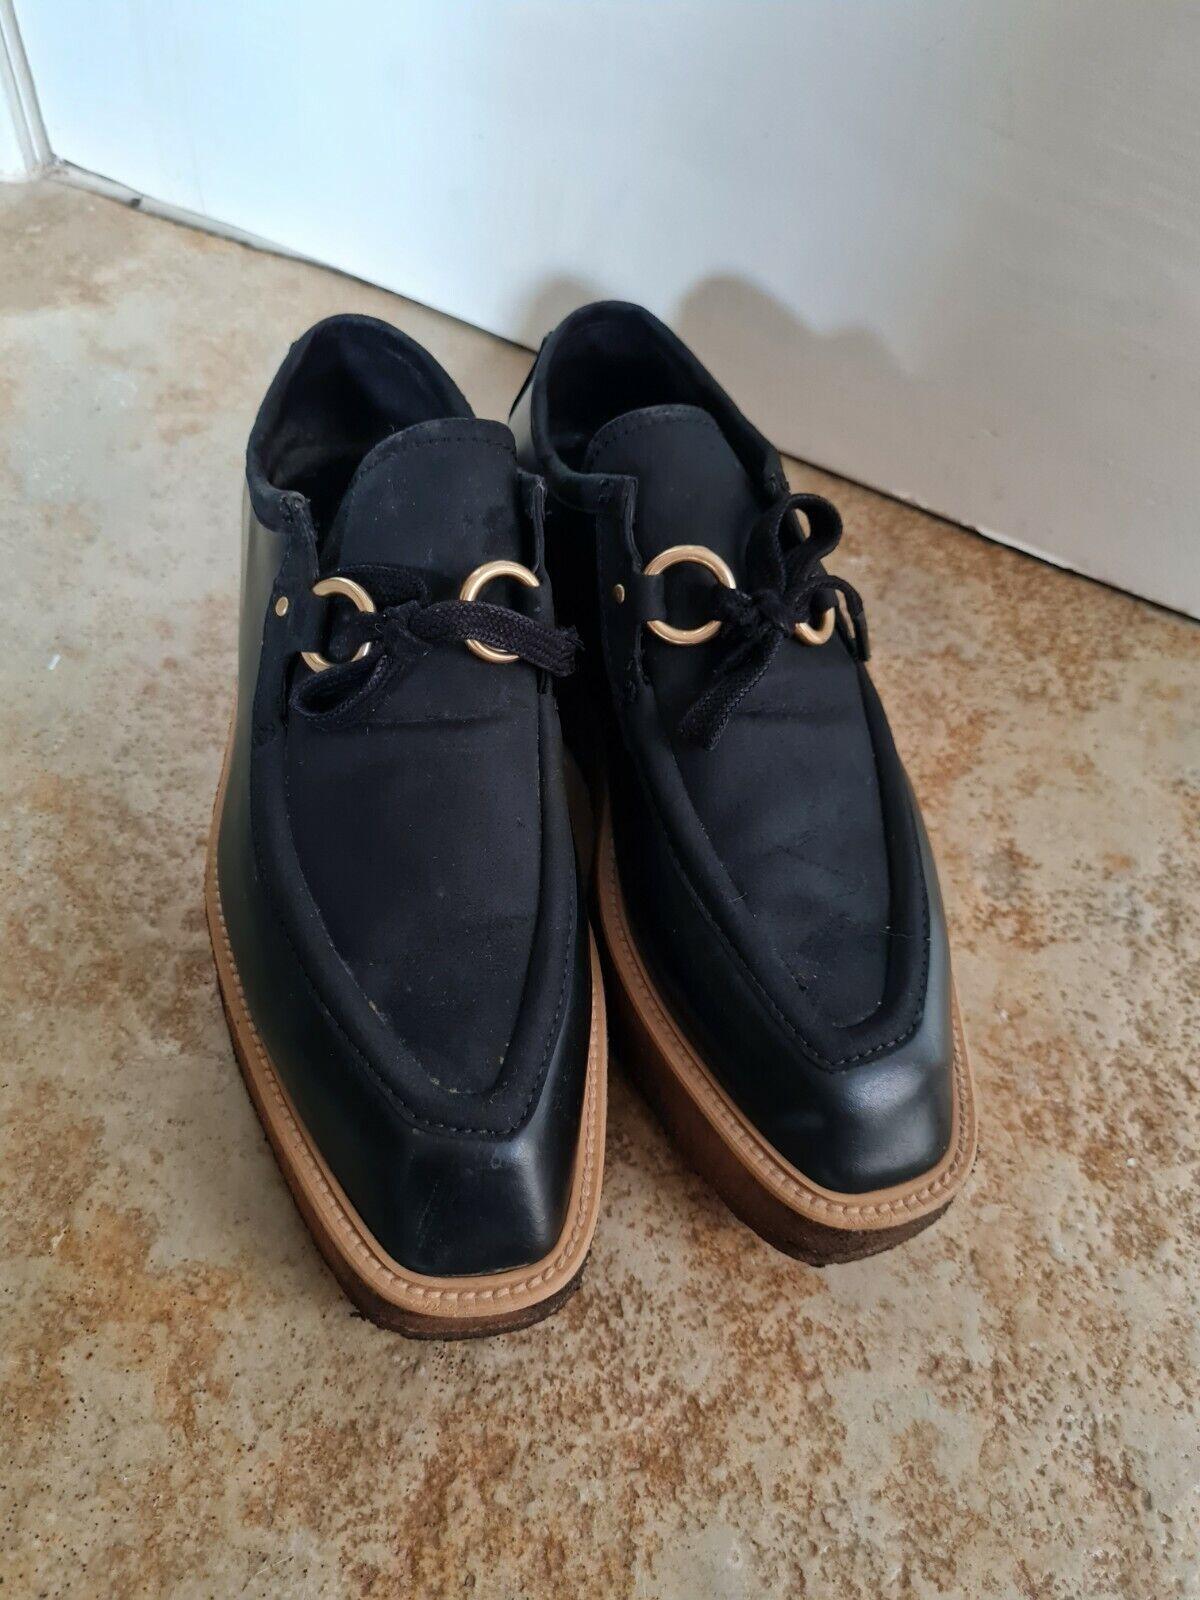 STELLA MCCARTNEY Brody Vegan Platform Loafers In Black Size 38.5 UK5.5